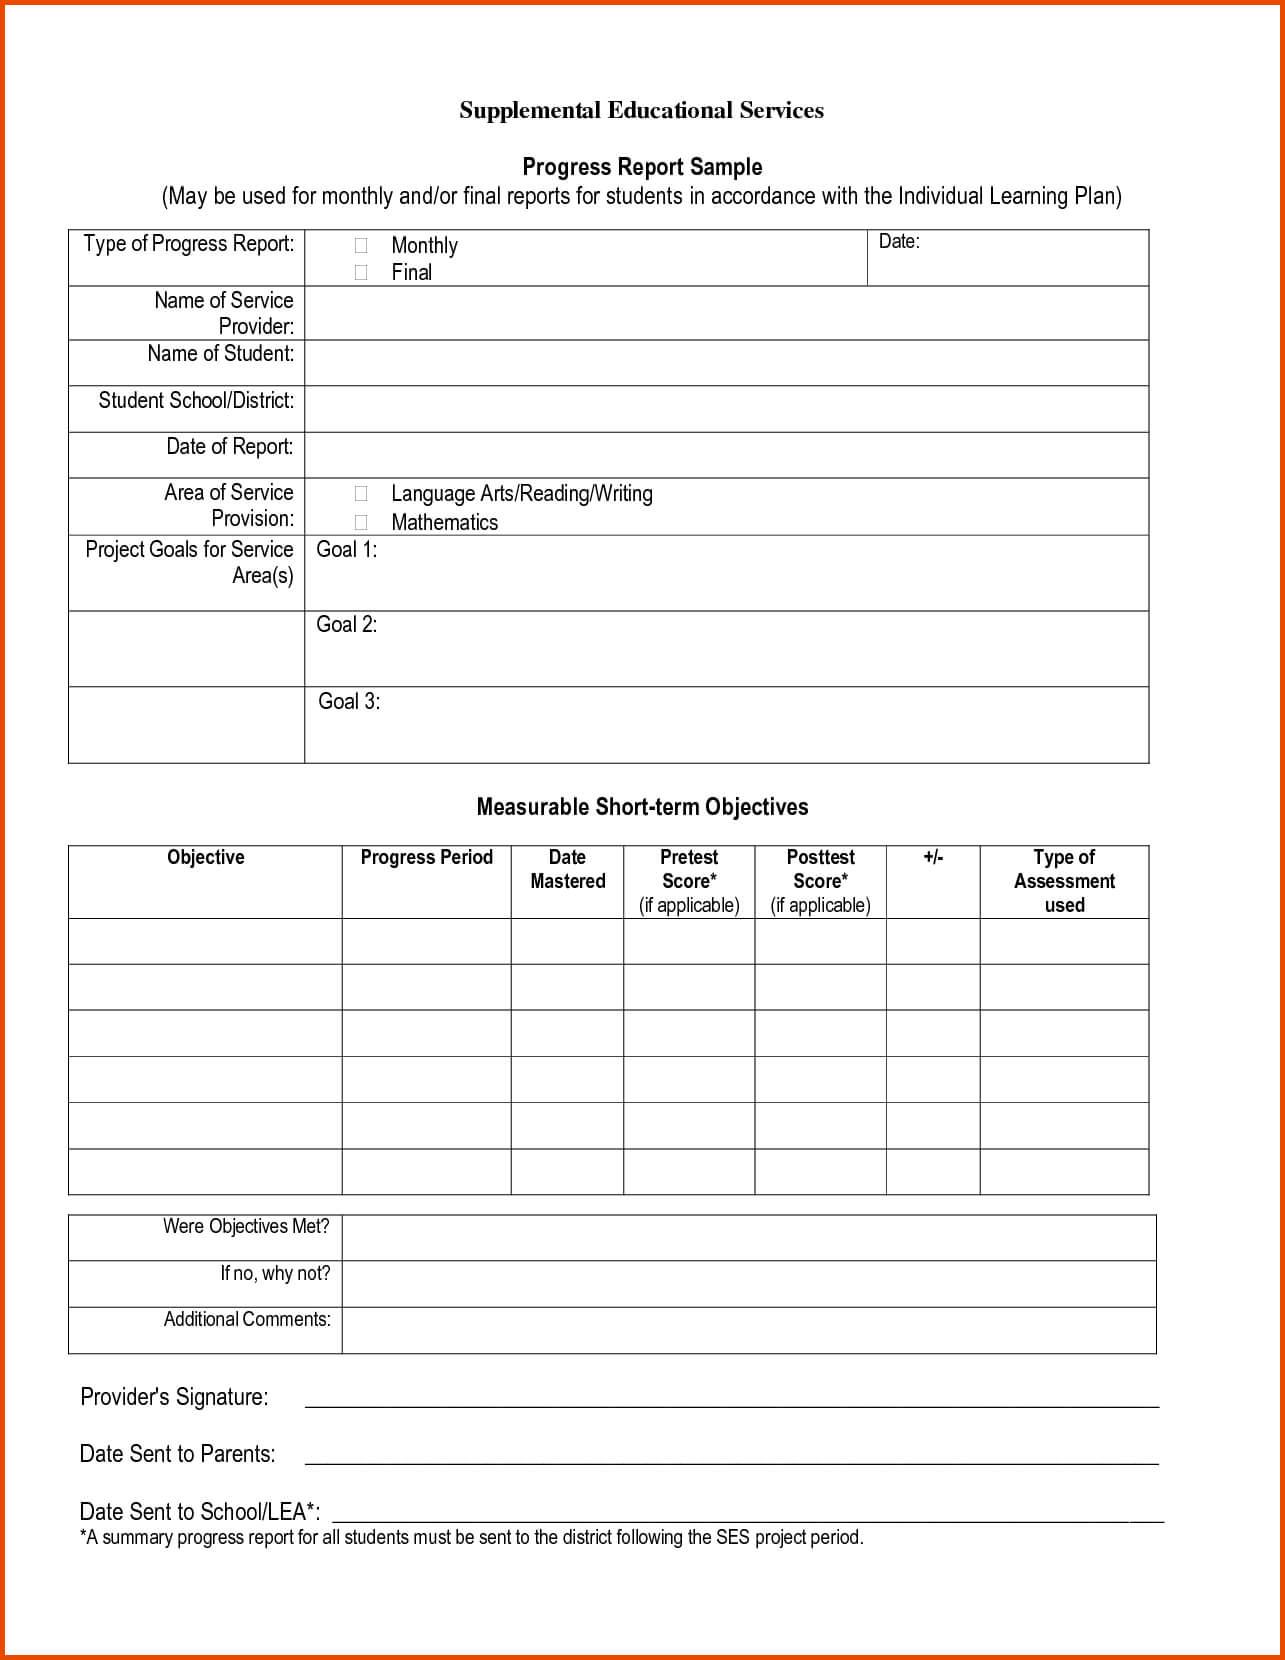 Pinmaricarl Carranza On Sample Progress Report For School Progress Report Template